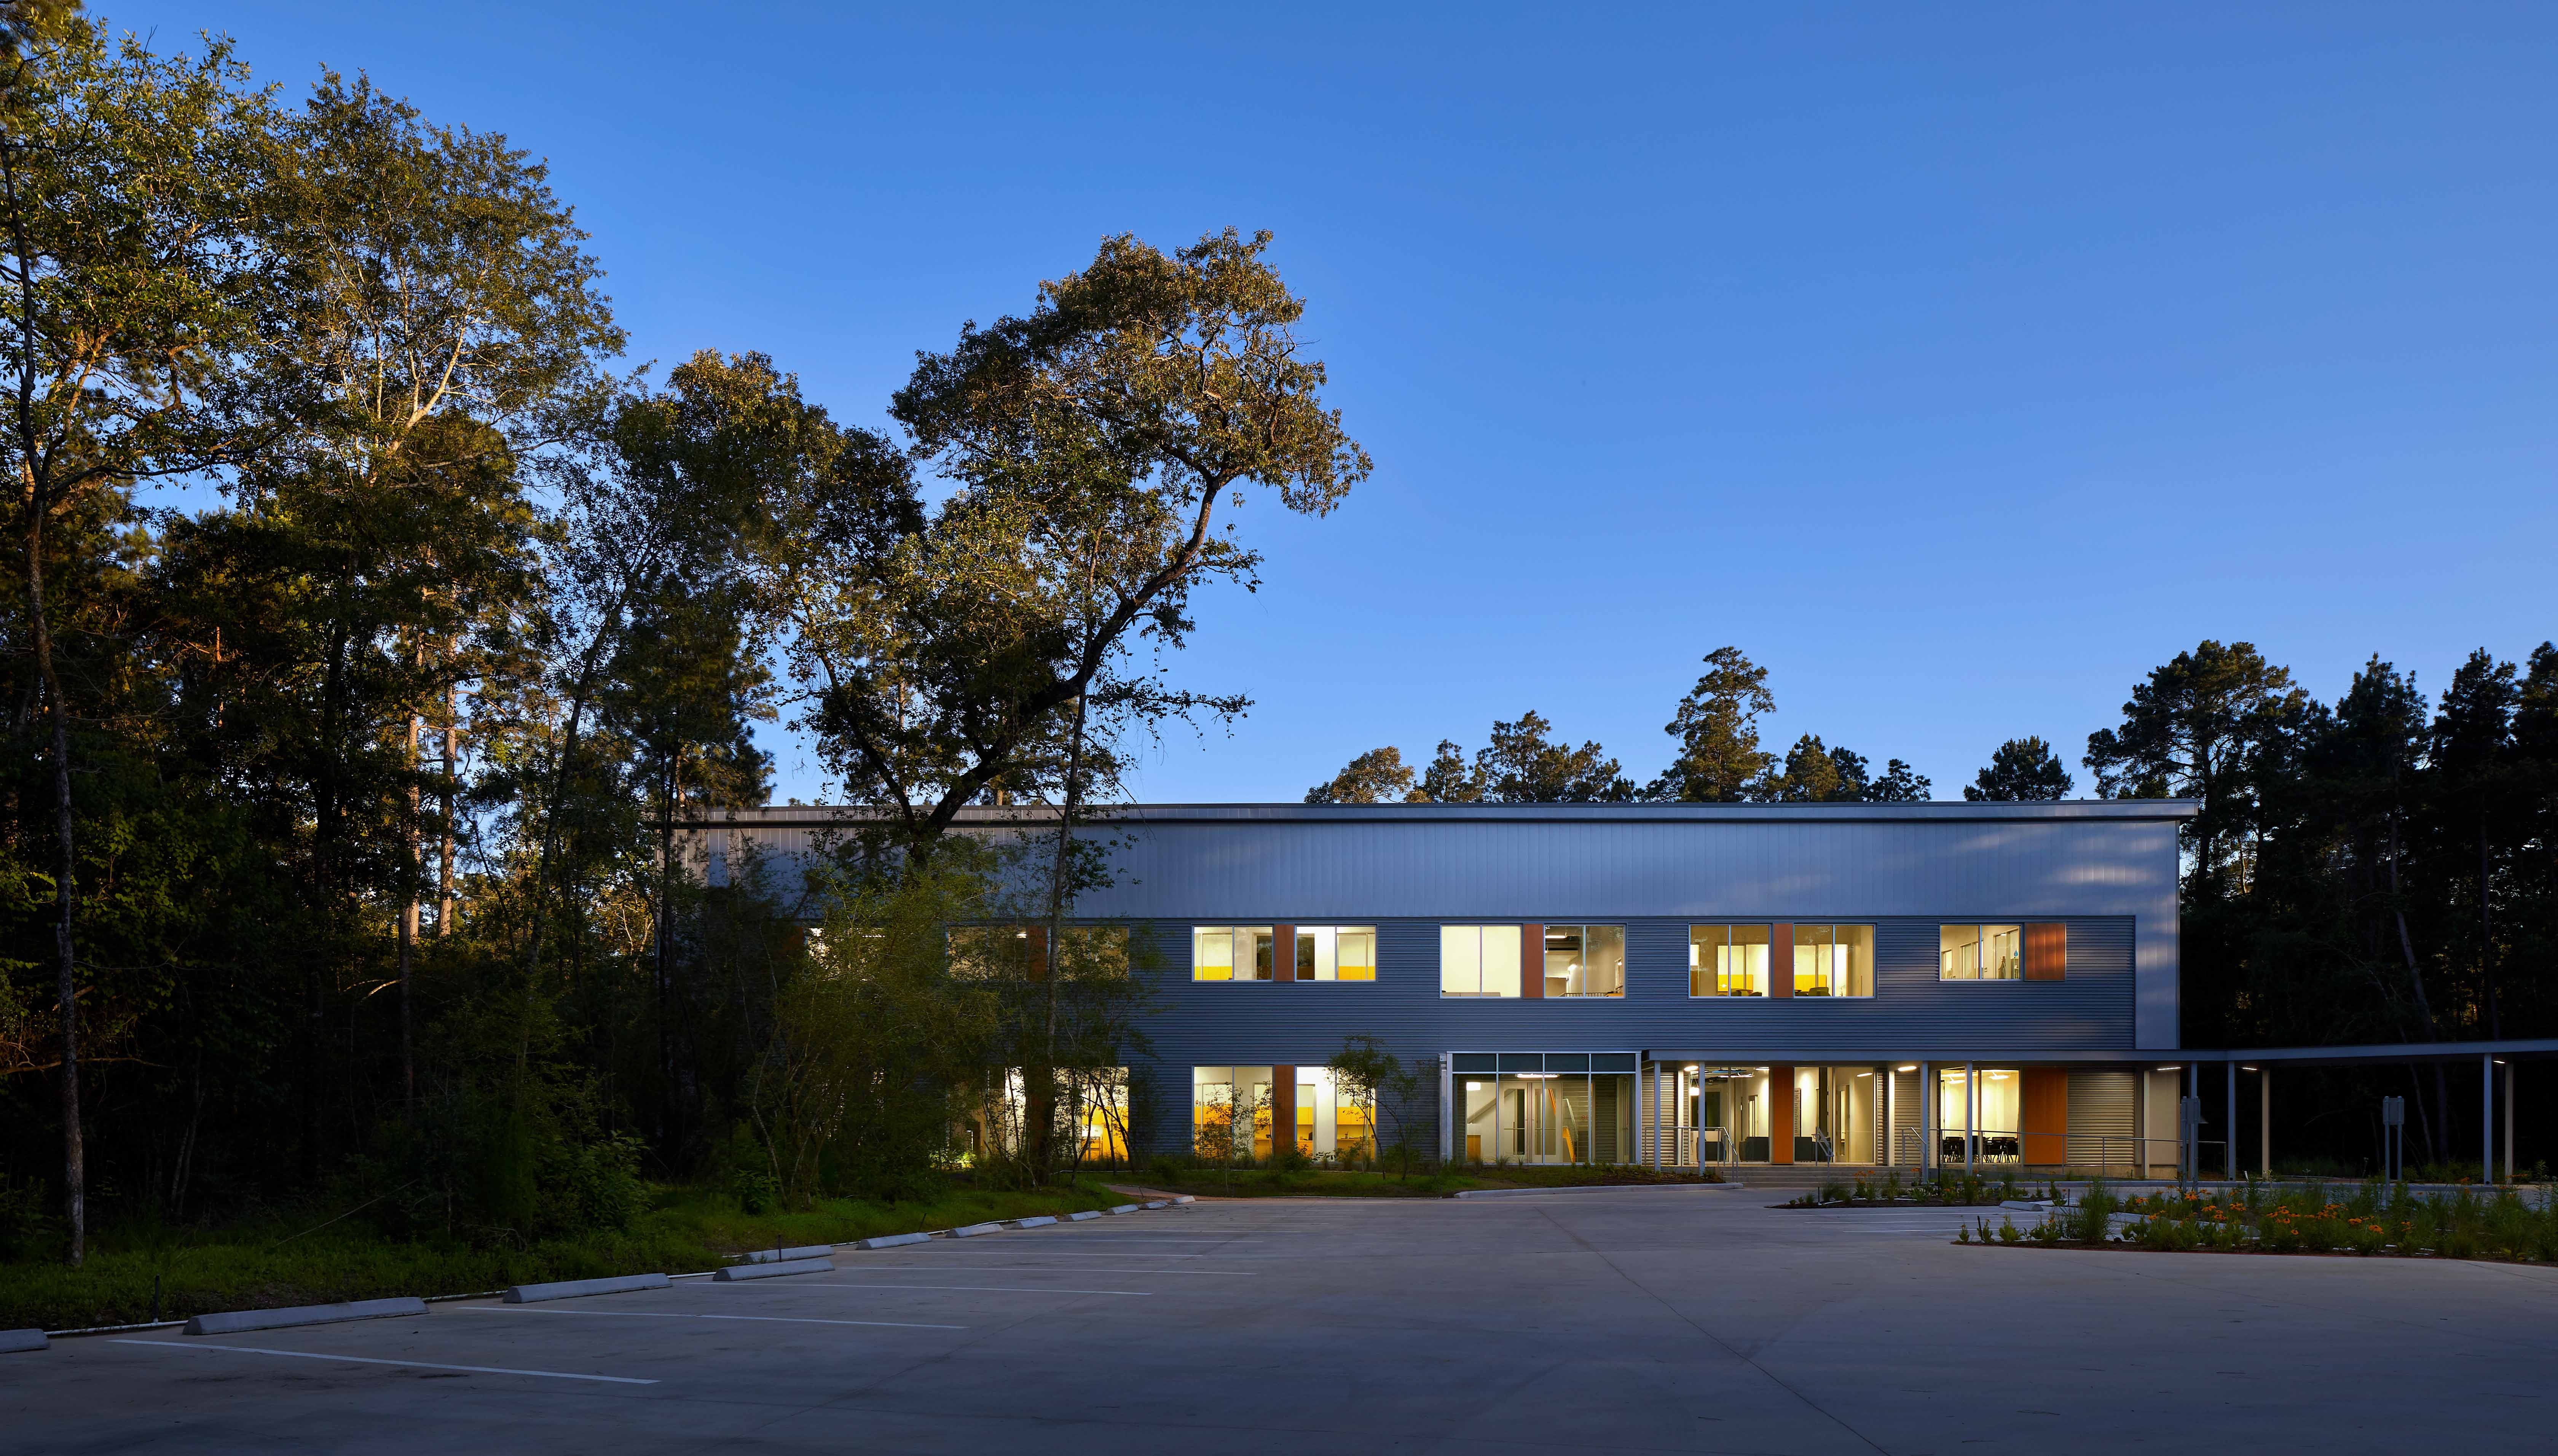 Harc Awarded Prestigious Leed Platinum Green Building Certification